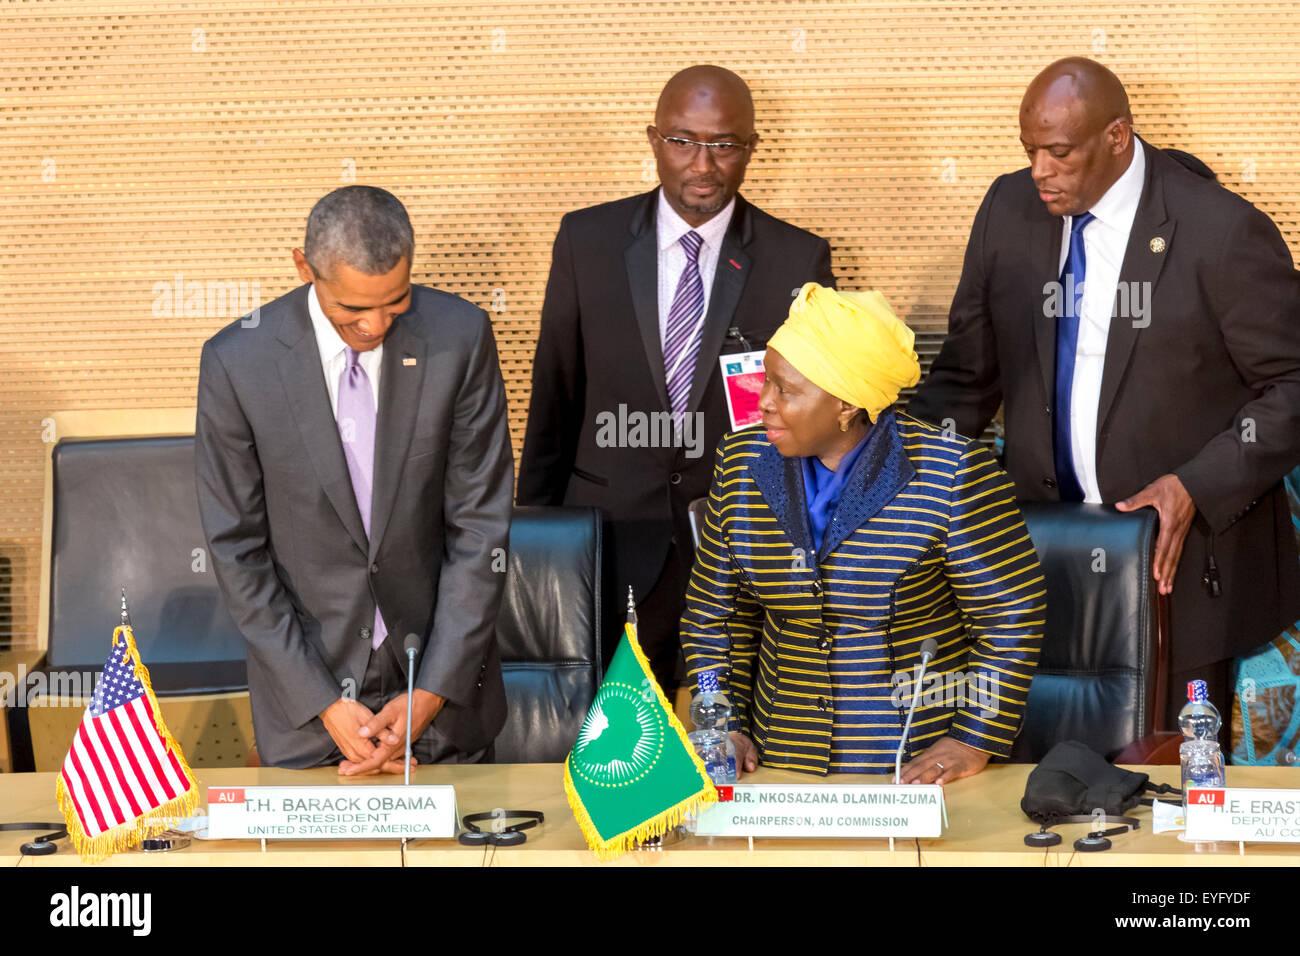 Addis Ababa, Ethiopia. 28th July, 2015. President Obama and Dr. Dlamini Zuma, take their designated seats at the - Stock Image